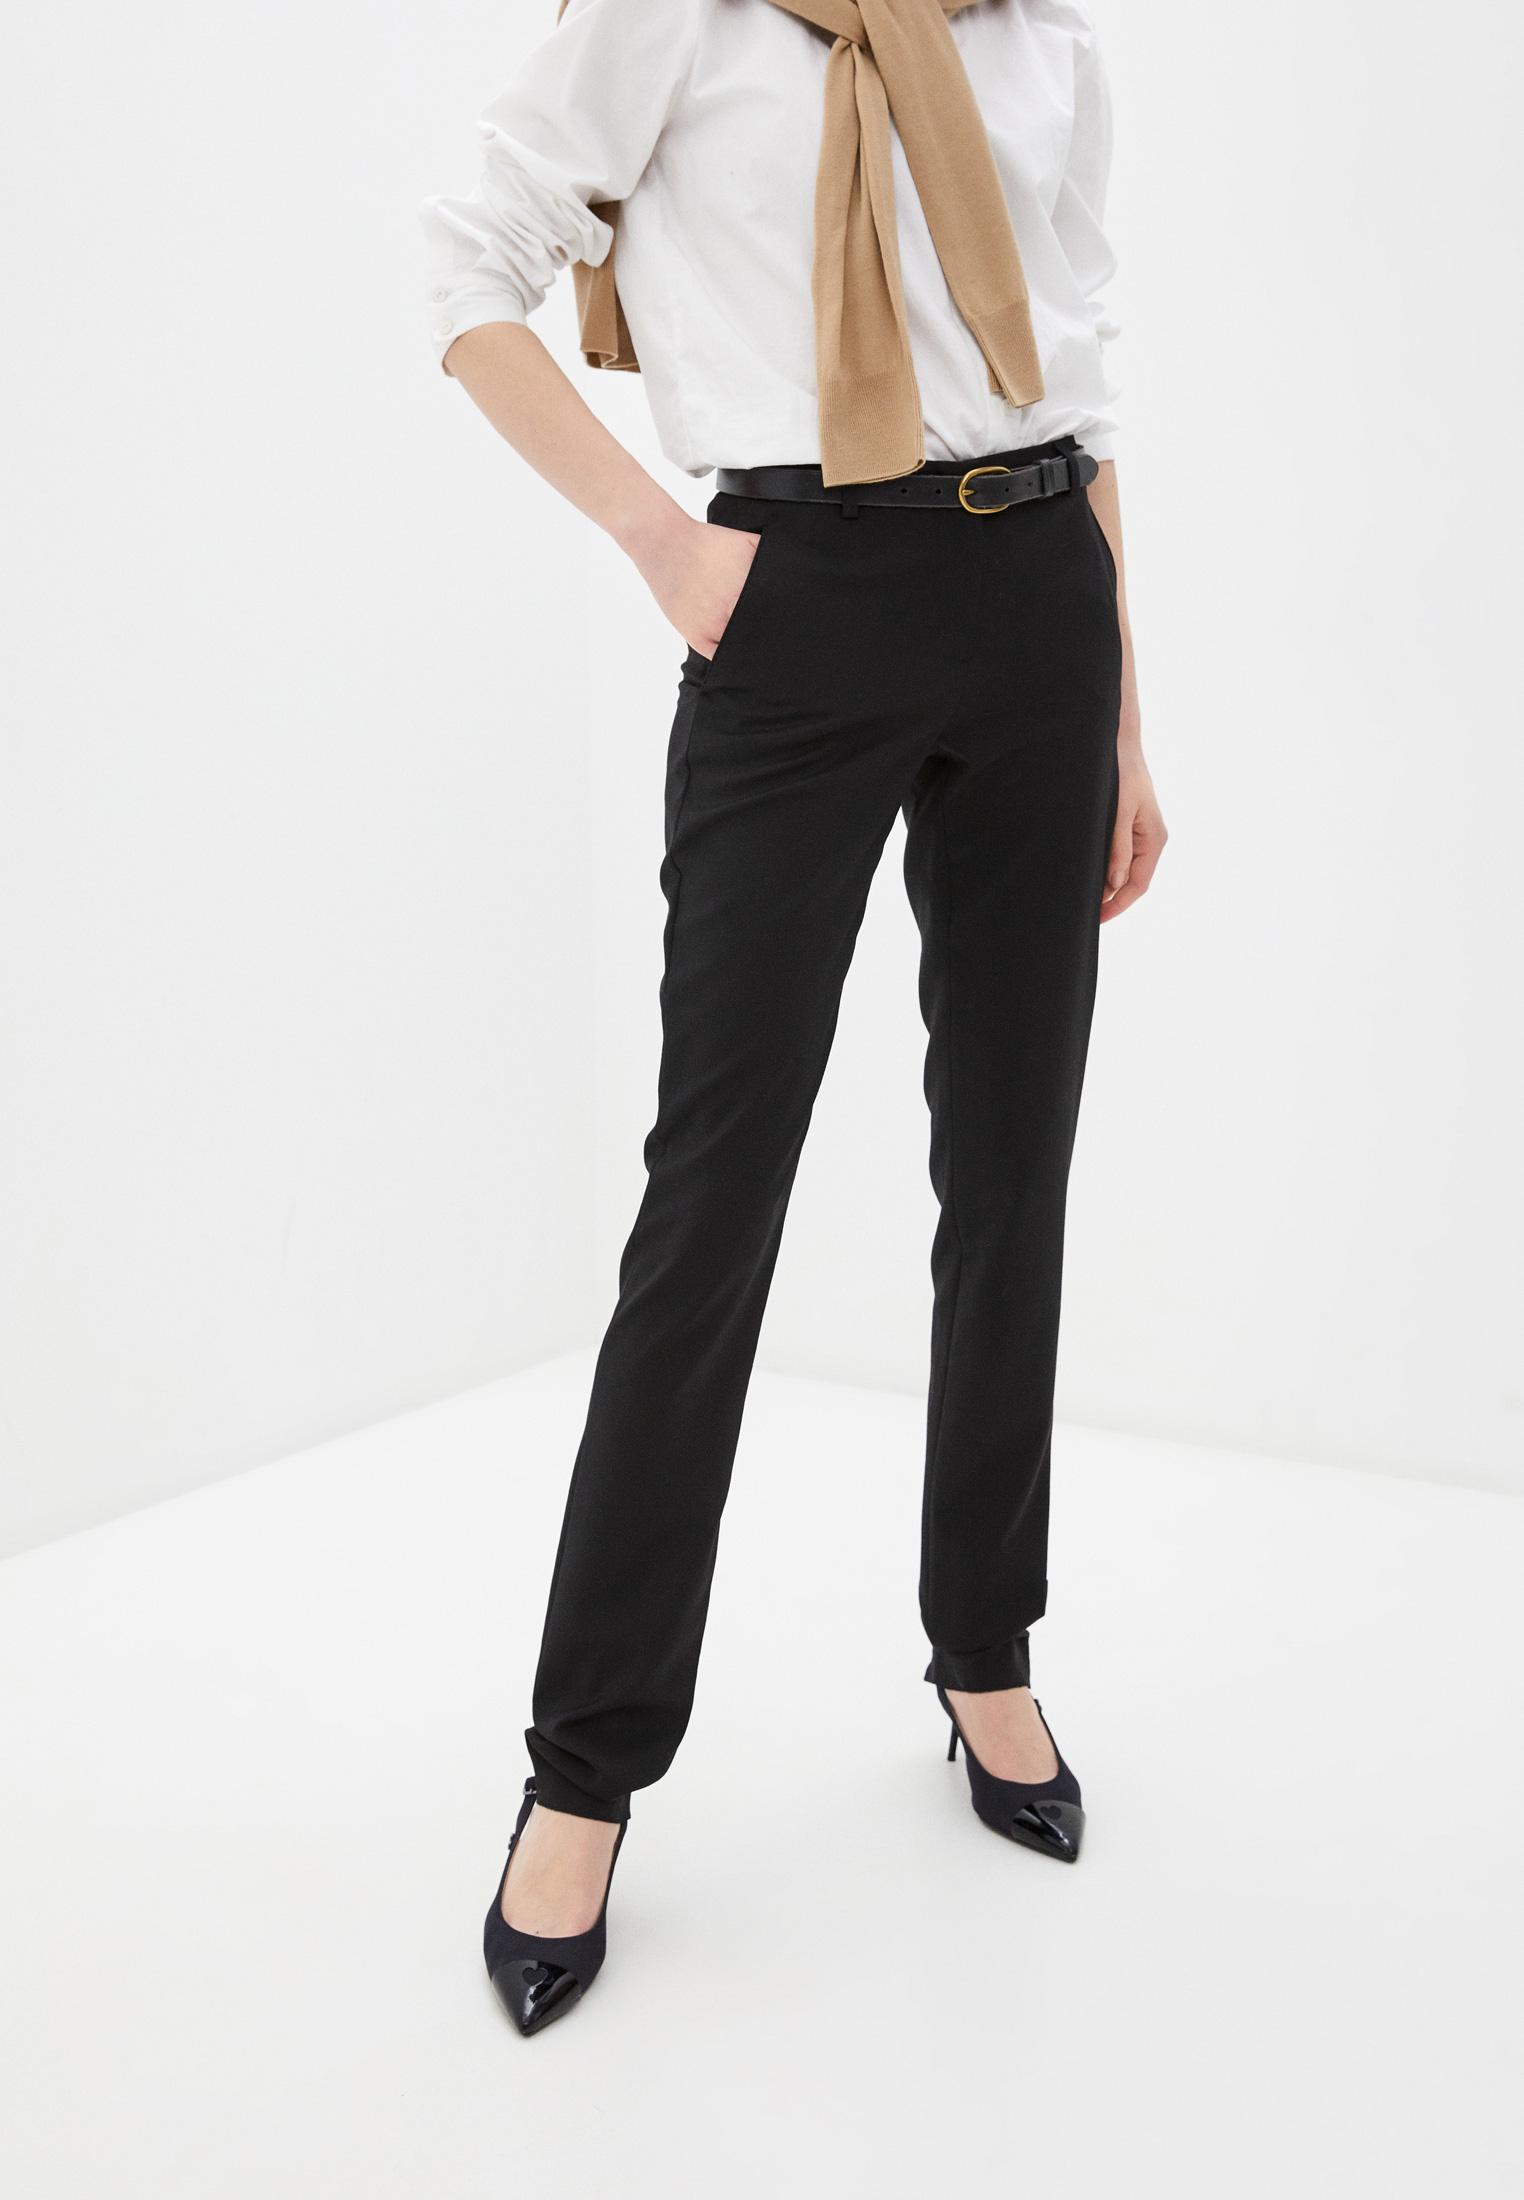 Женские классические брюки Burberry Брюки Burberry